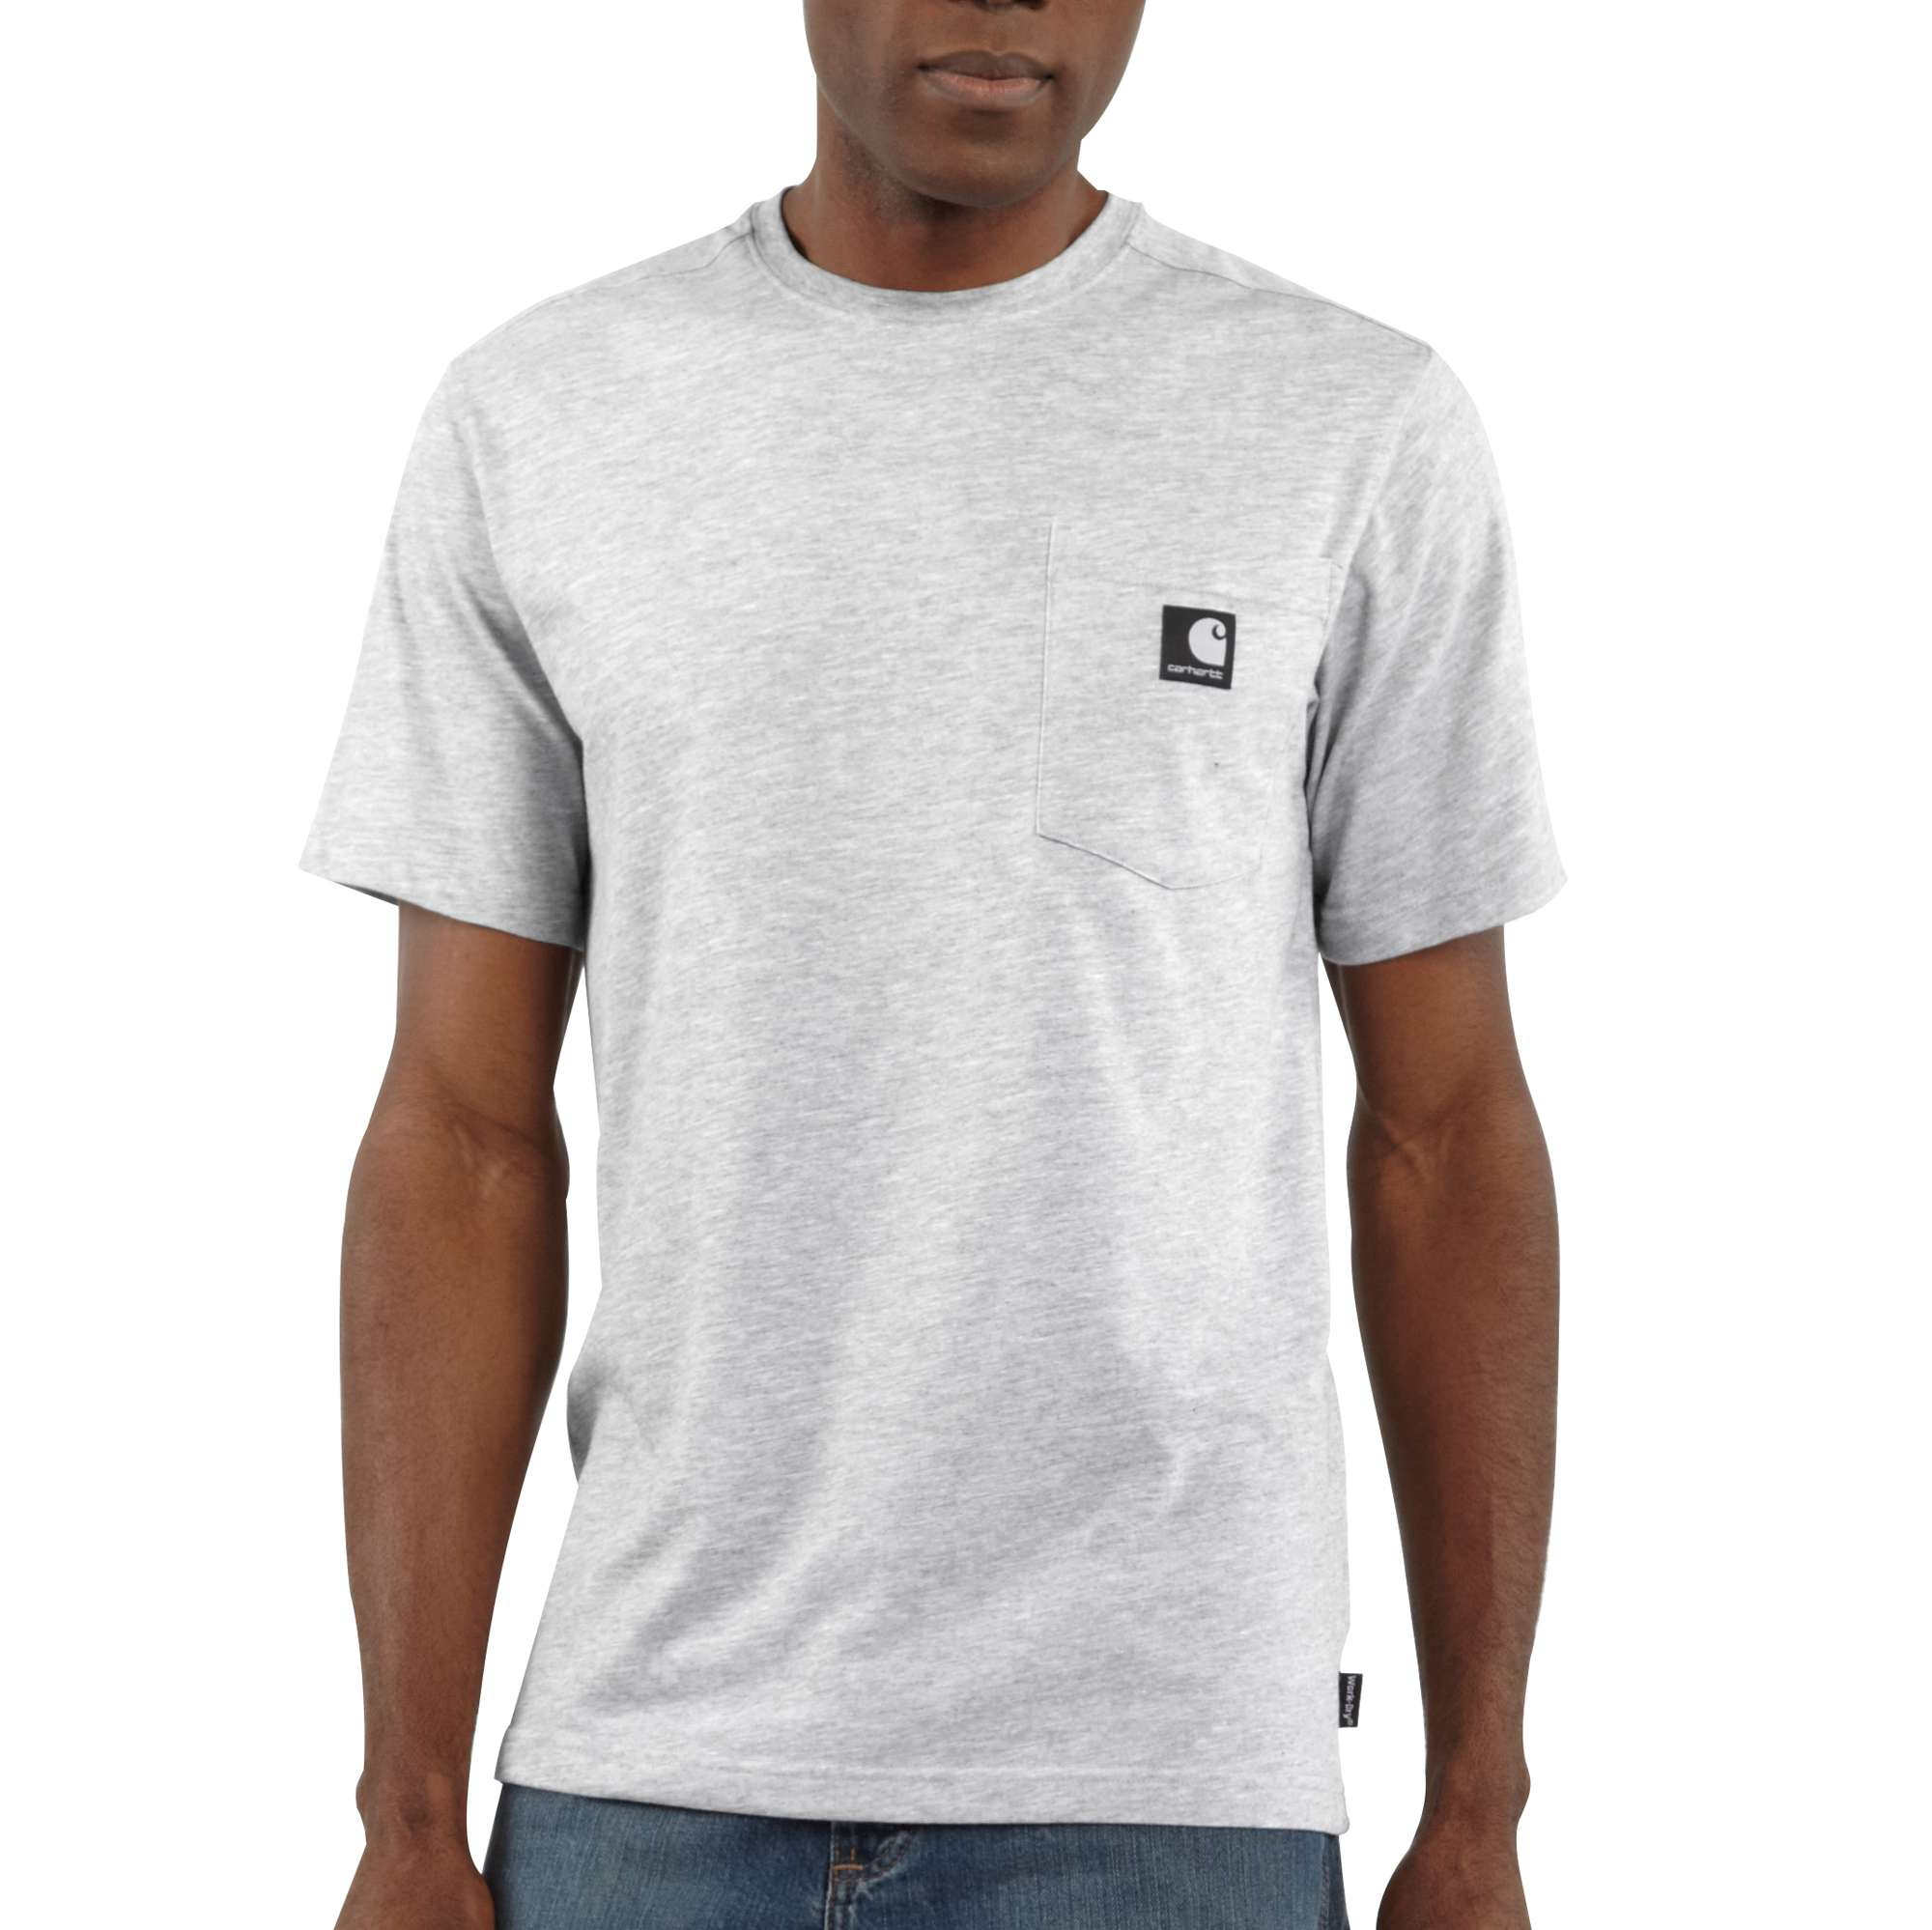 Carhartt Short Sleeve Work-Dry T-Shirt